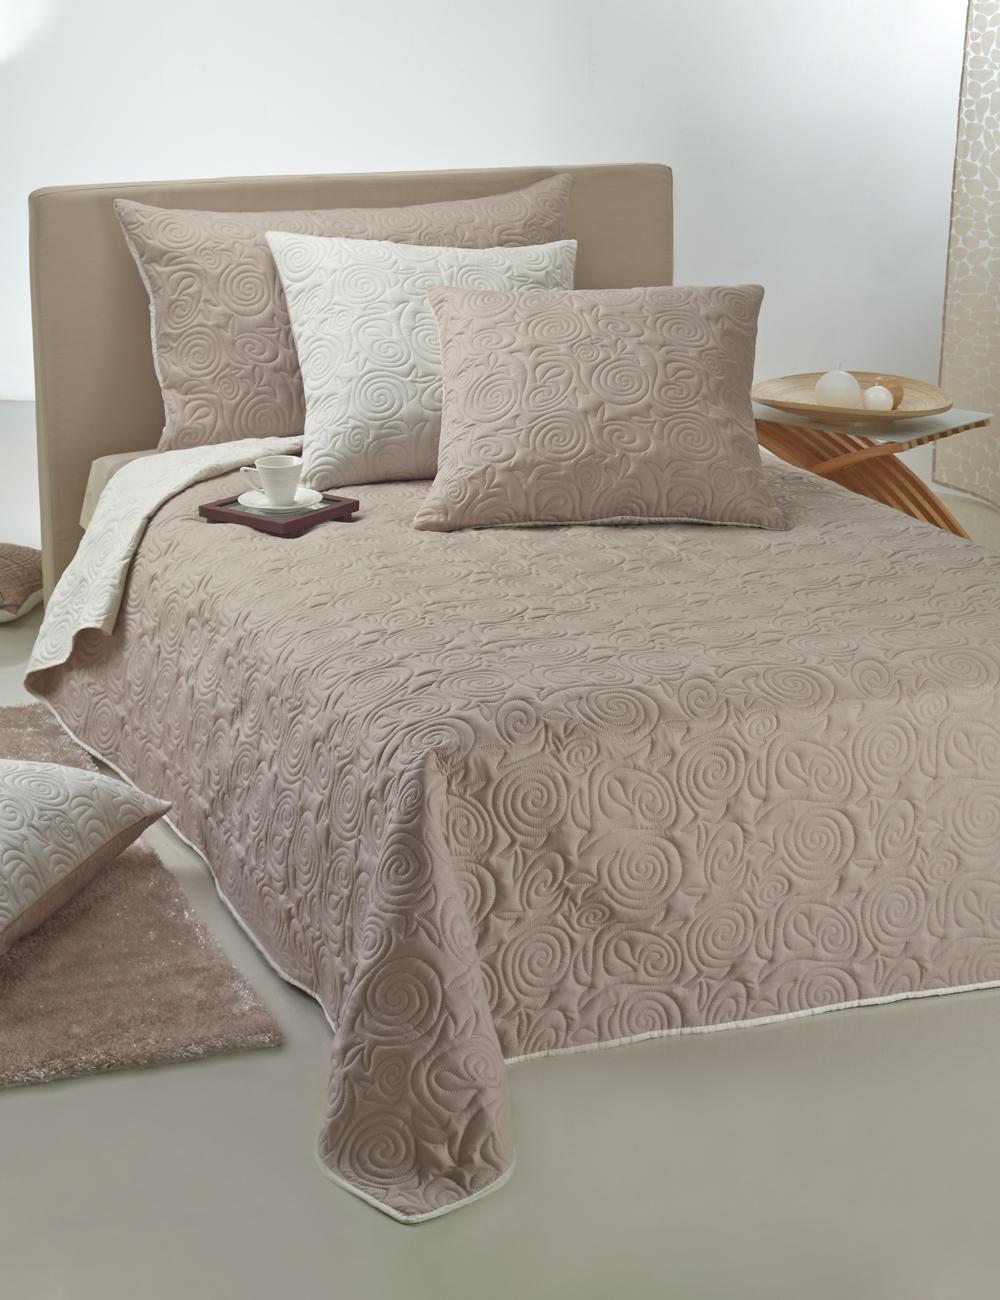 bett berwurf ultra 240 x 260 cm elfenbein taupe. Black Bedroom Furniture Sets. Home Design Ideas